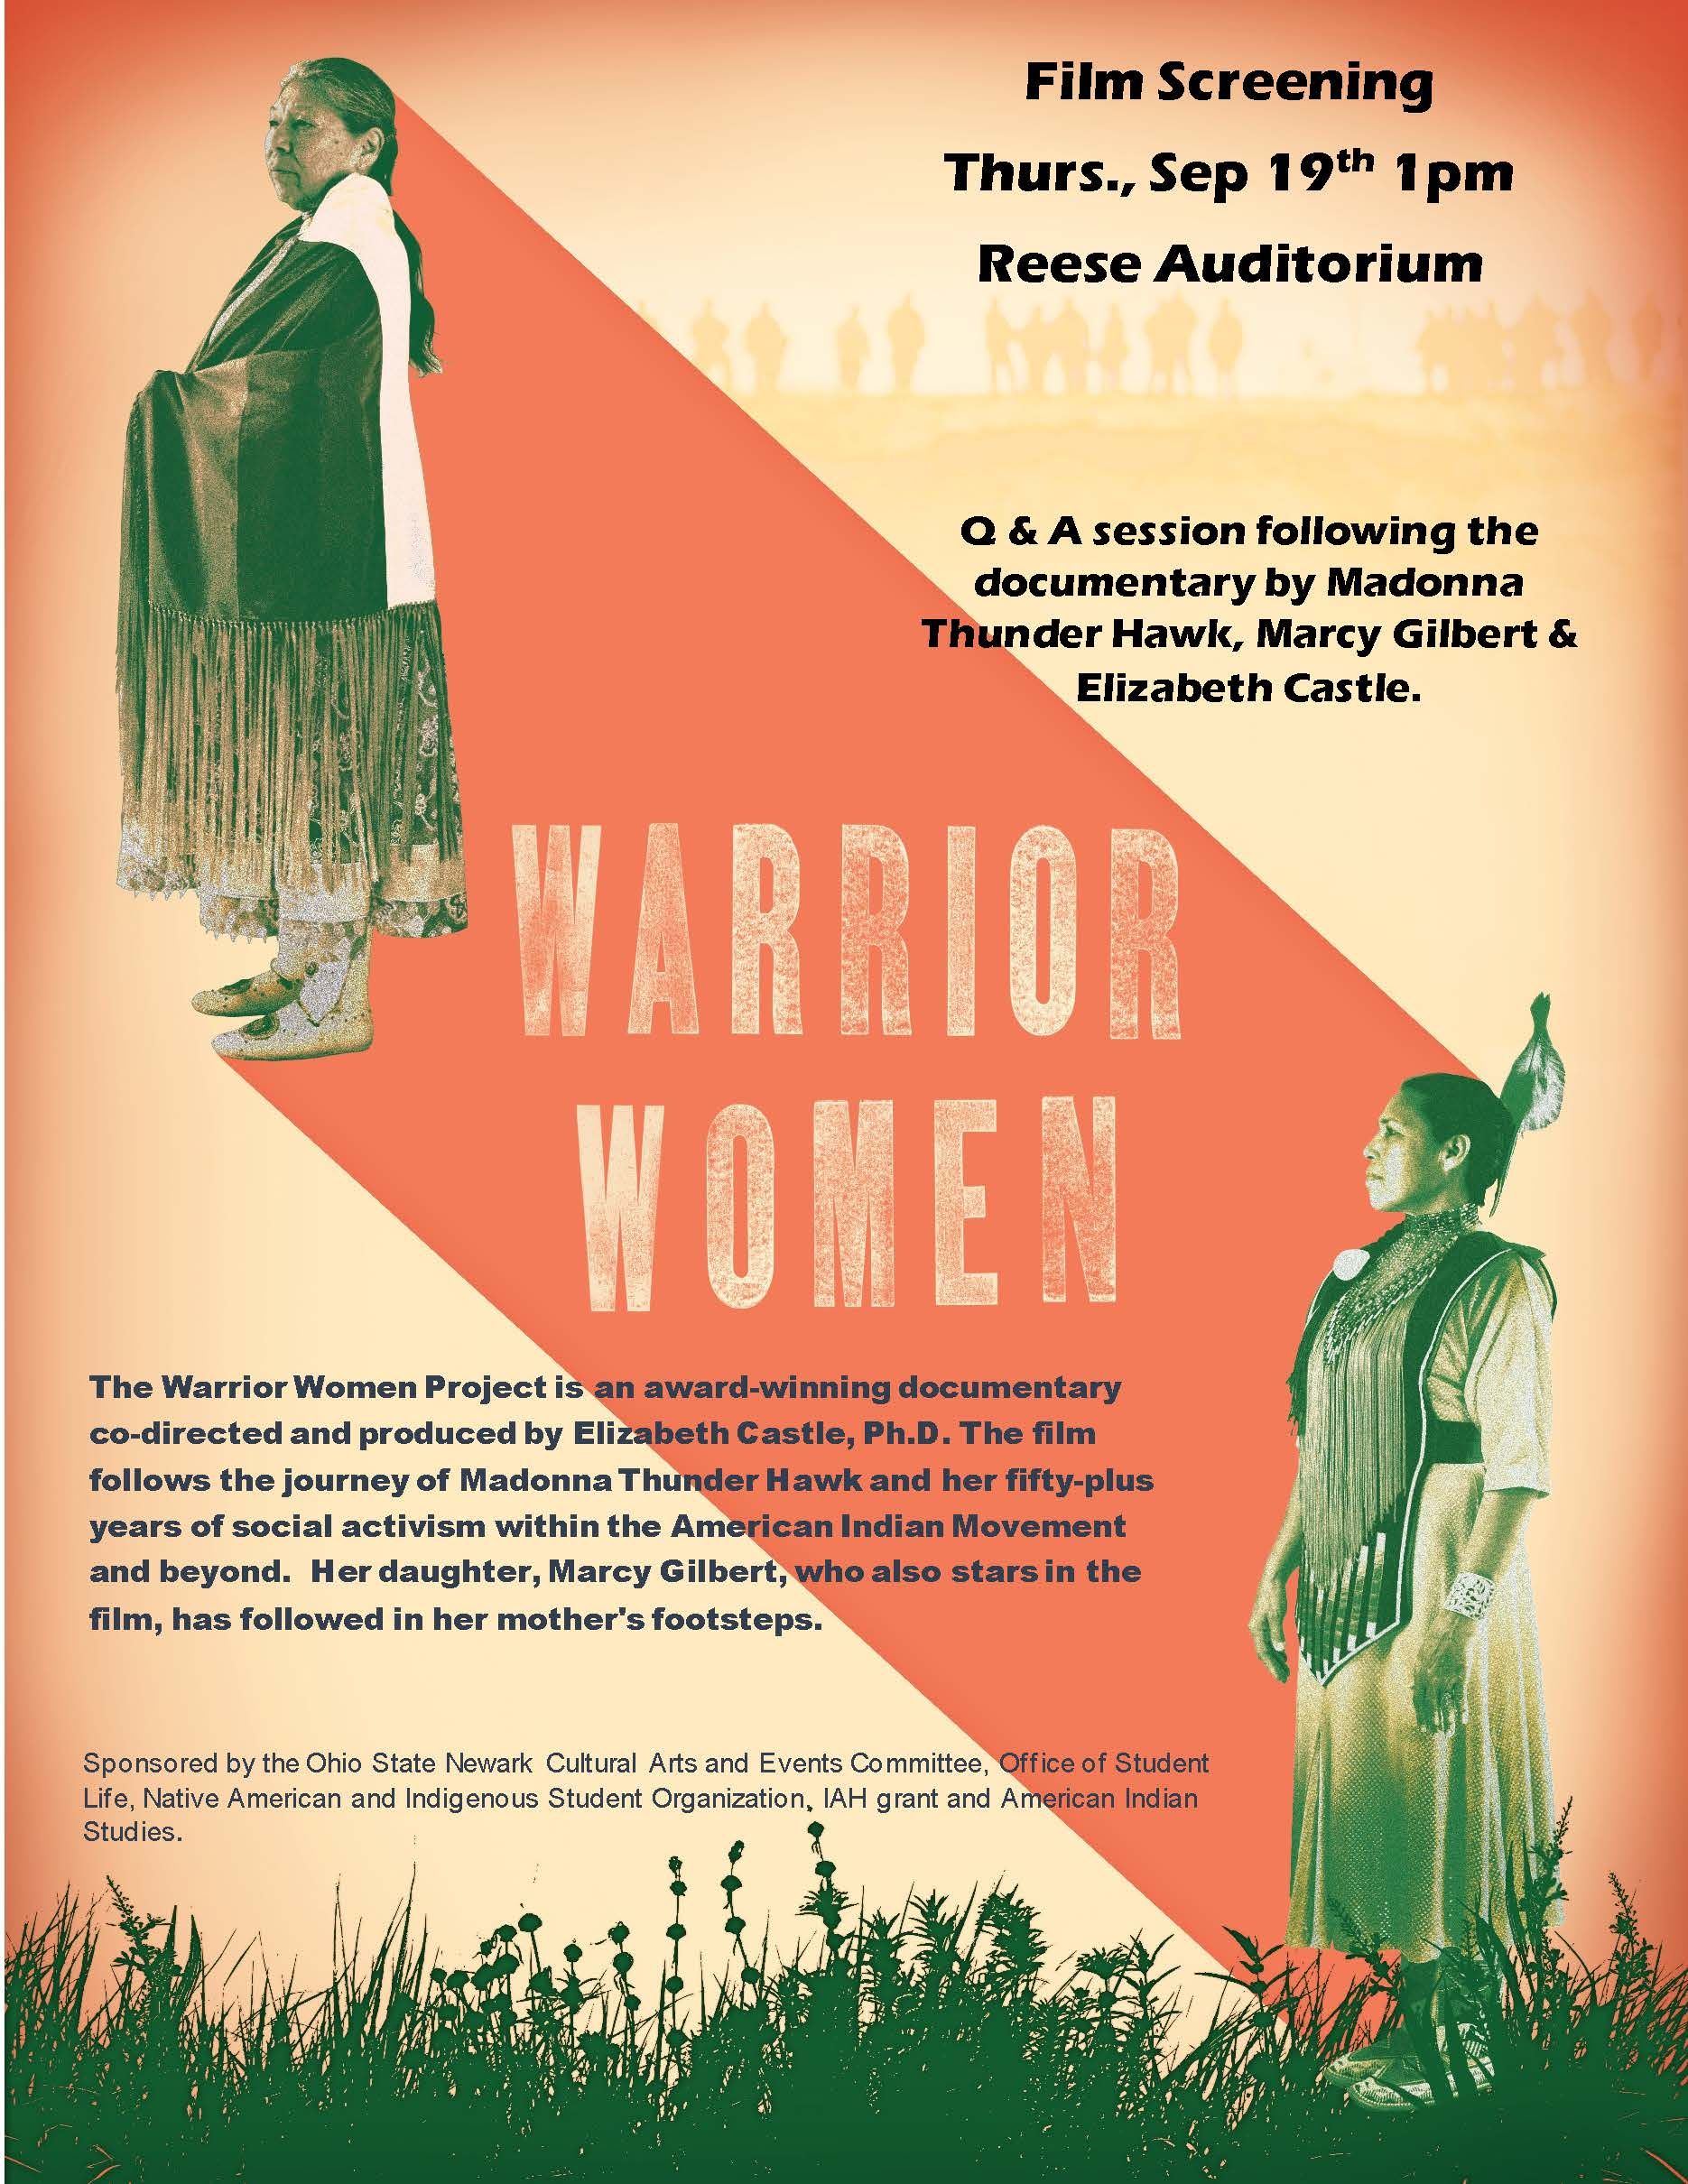 Warrior Women Project